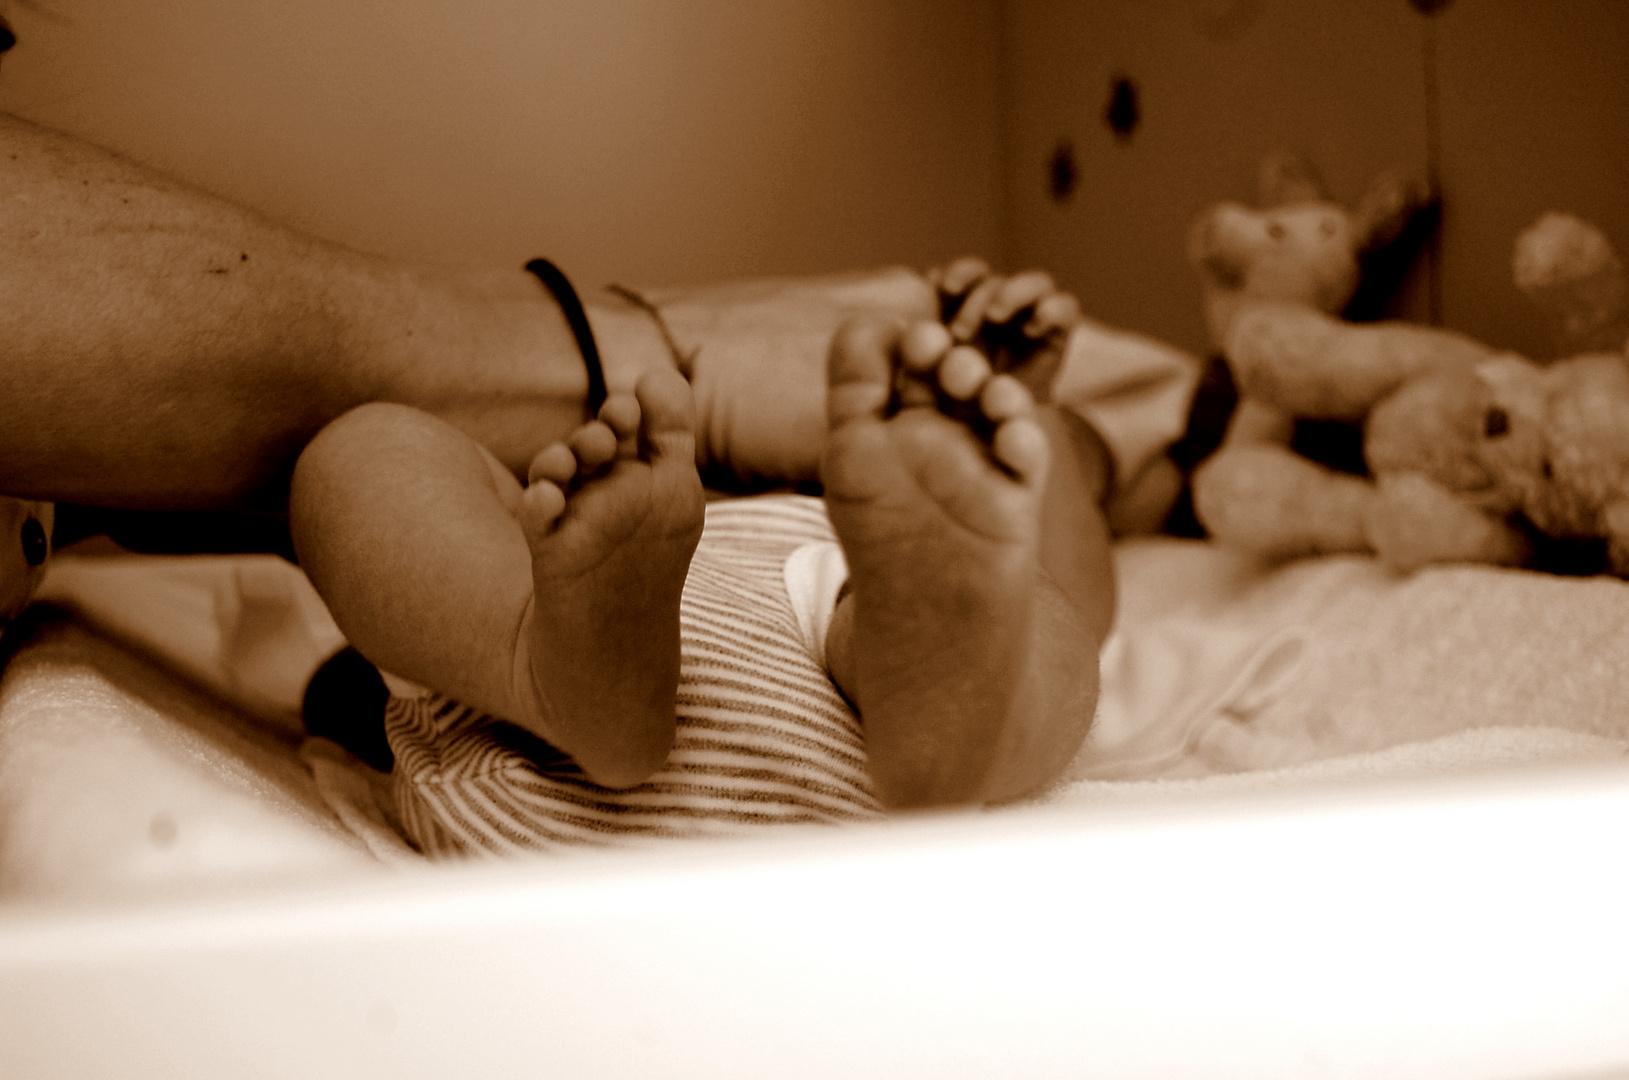 valentina's feet